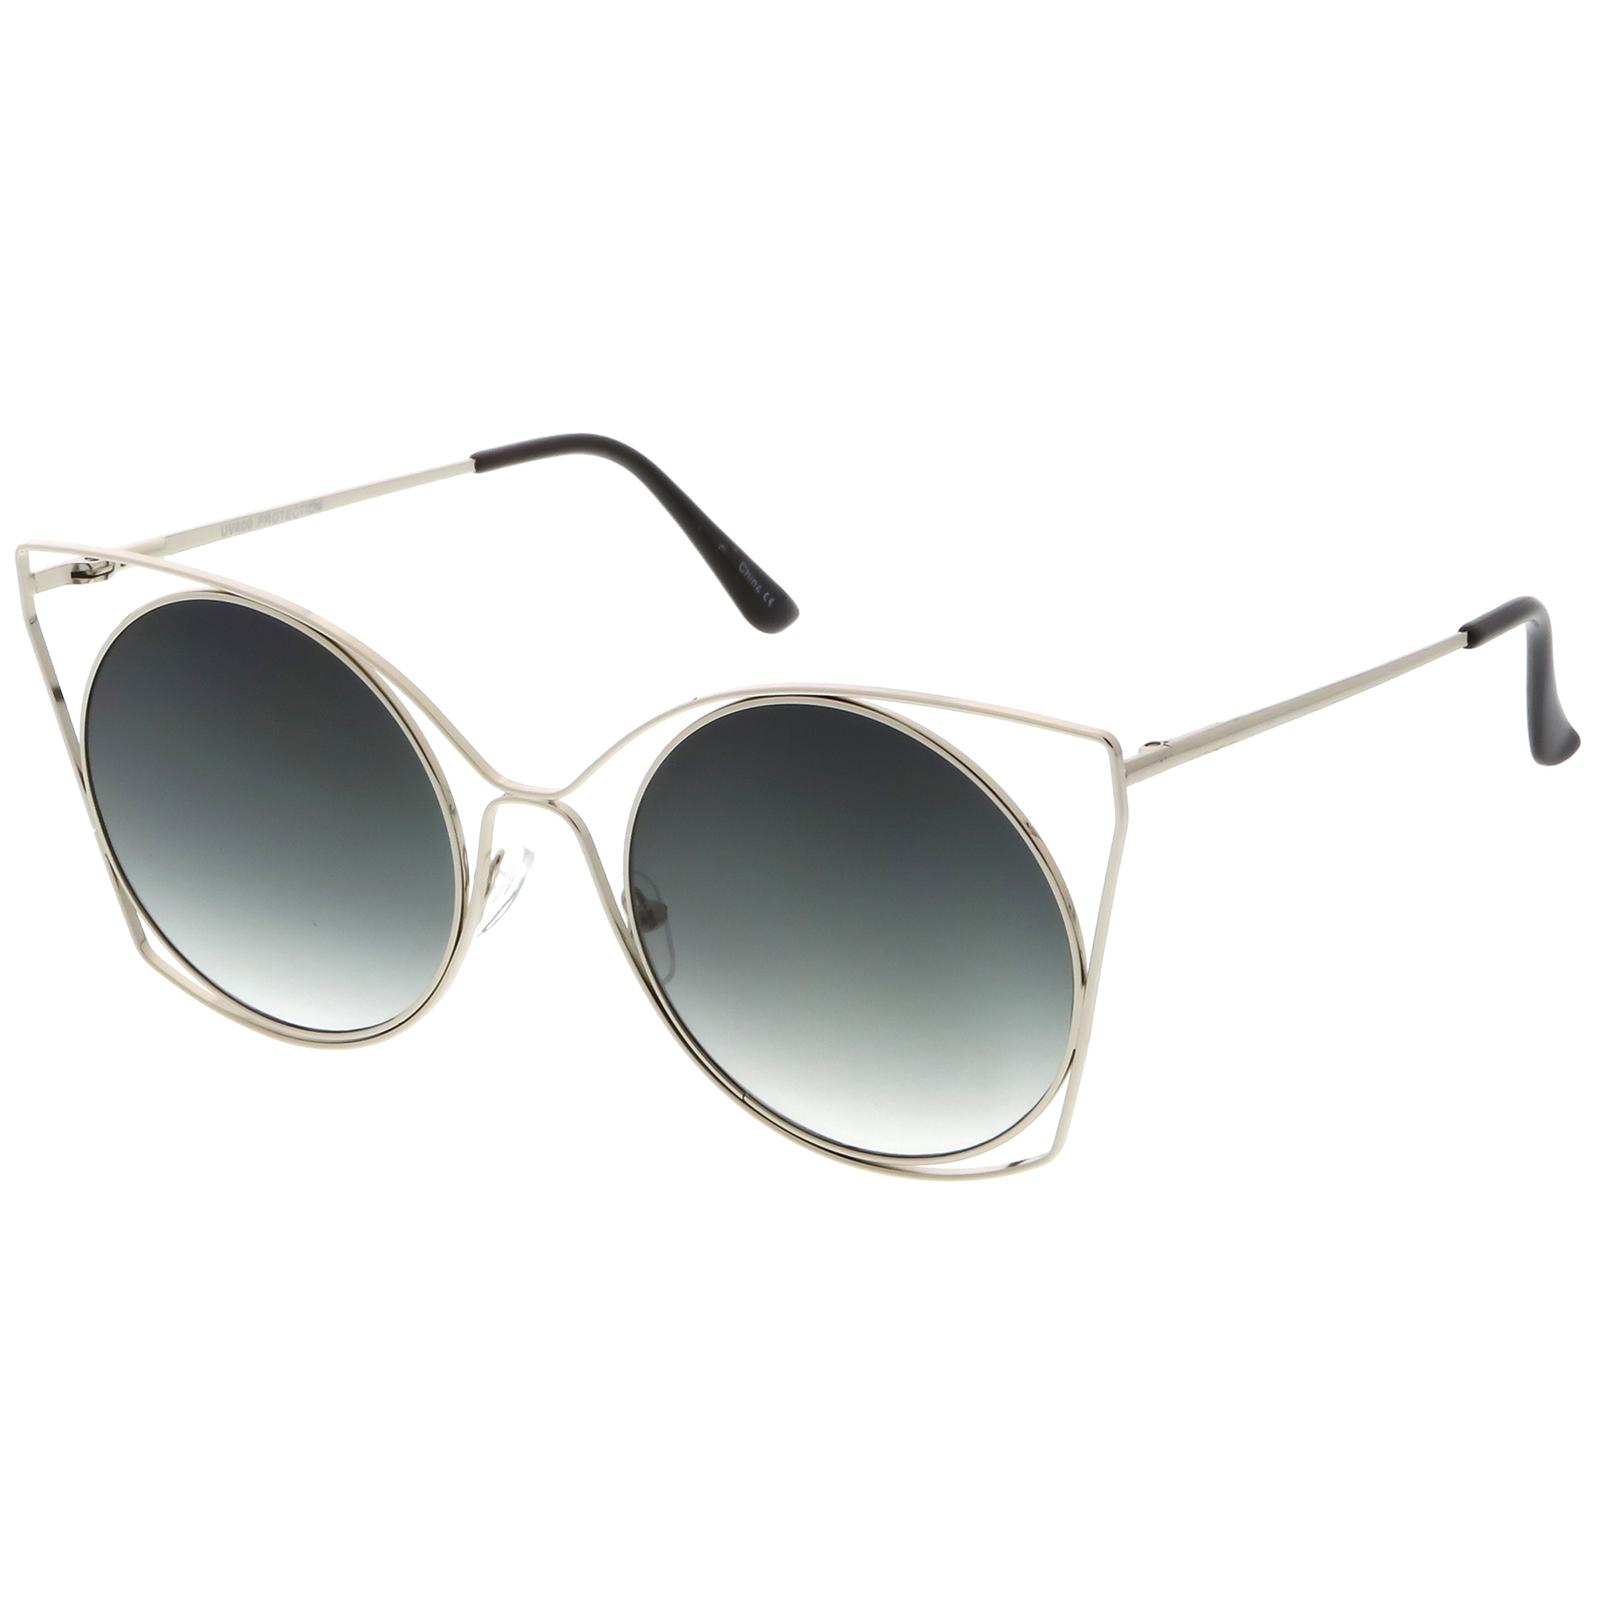 sunglassla überdimensional offen Metall Cat Eye Sonnenbrille Ultra flaches Glas PqiPH5